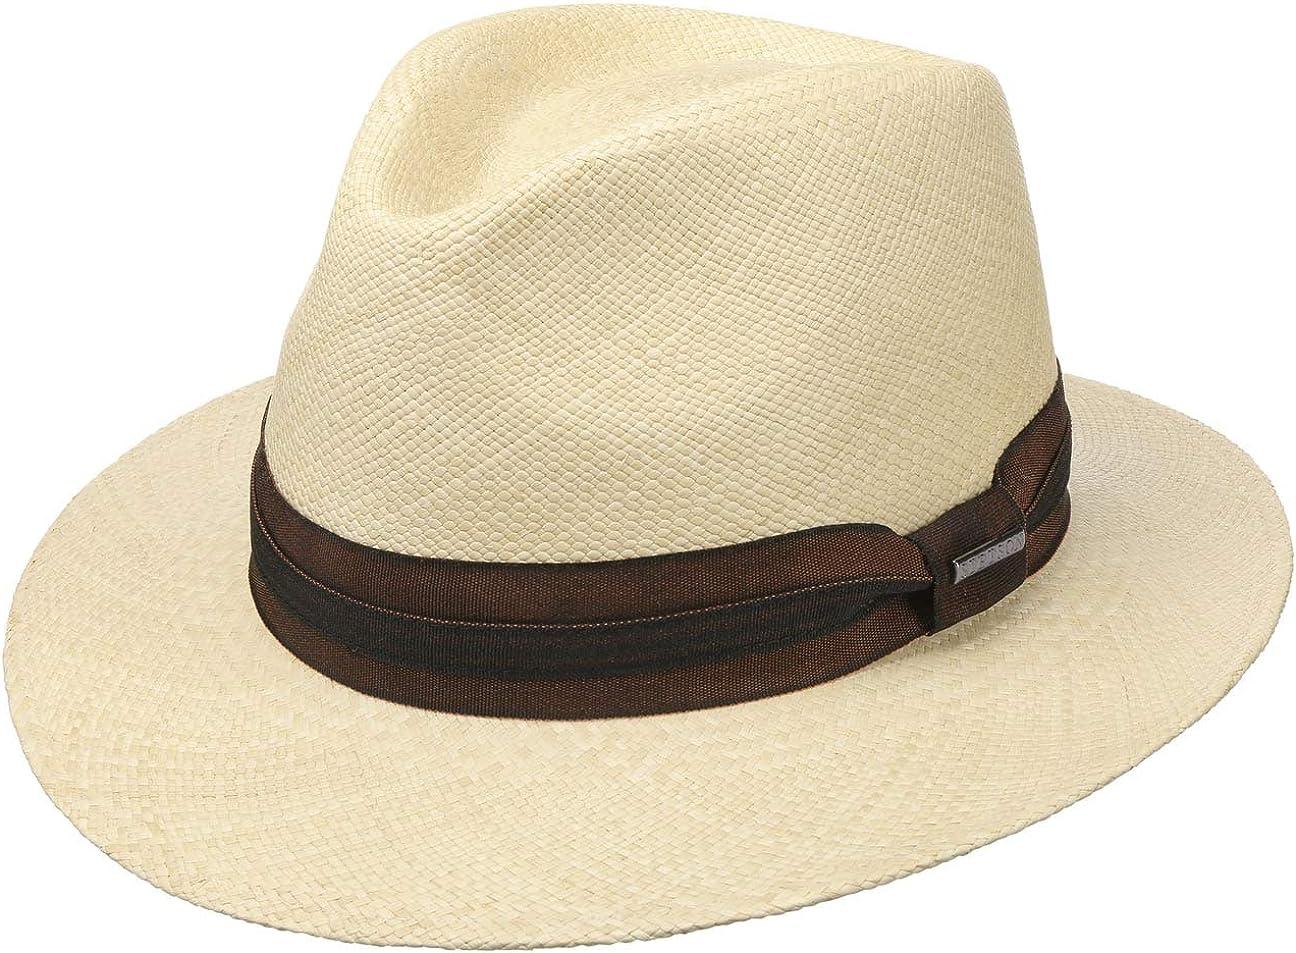 Stetson Sombrero Panamá Kamarro Hombre - Made in Ecuador de Sol Verano Paja Primavera/Verano